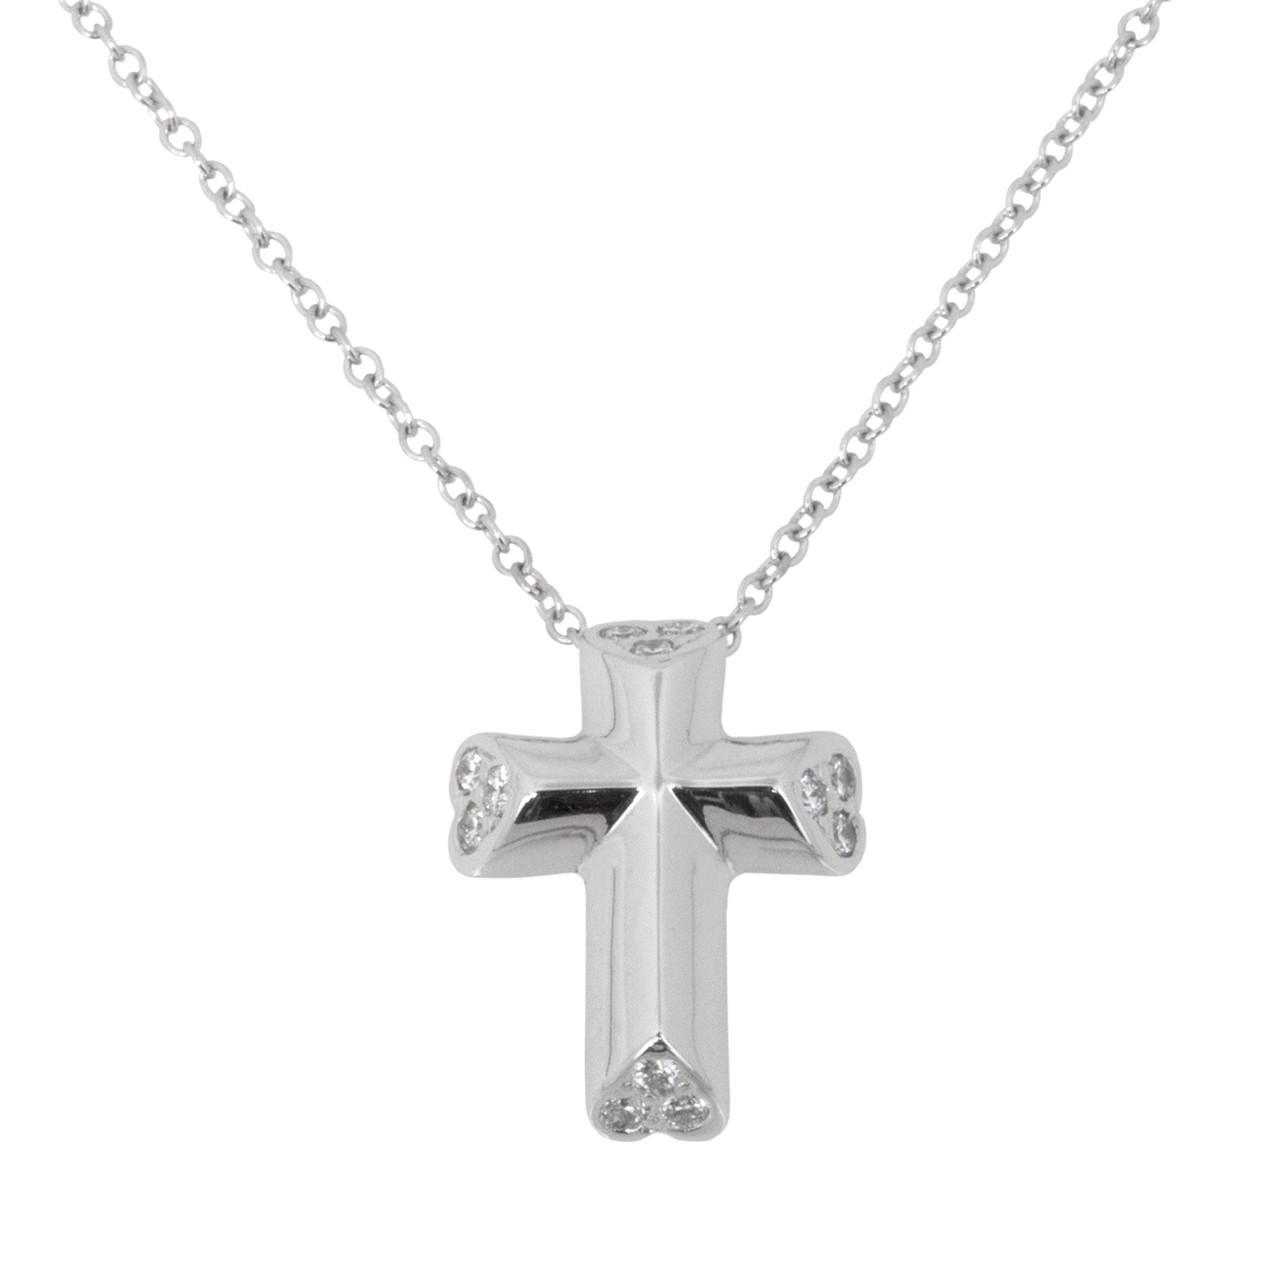 bc994df679c11 Tiffany & Co. 18K White Gold & Diamond Tenderness Heart Cross Pendant